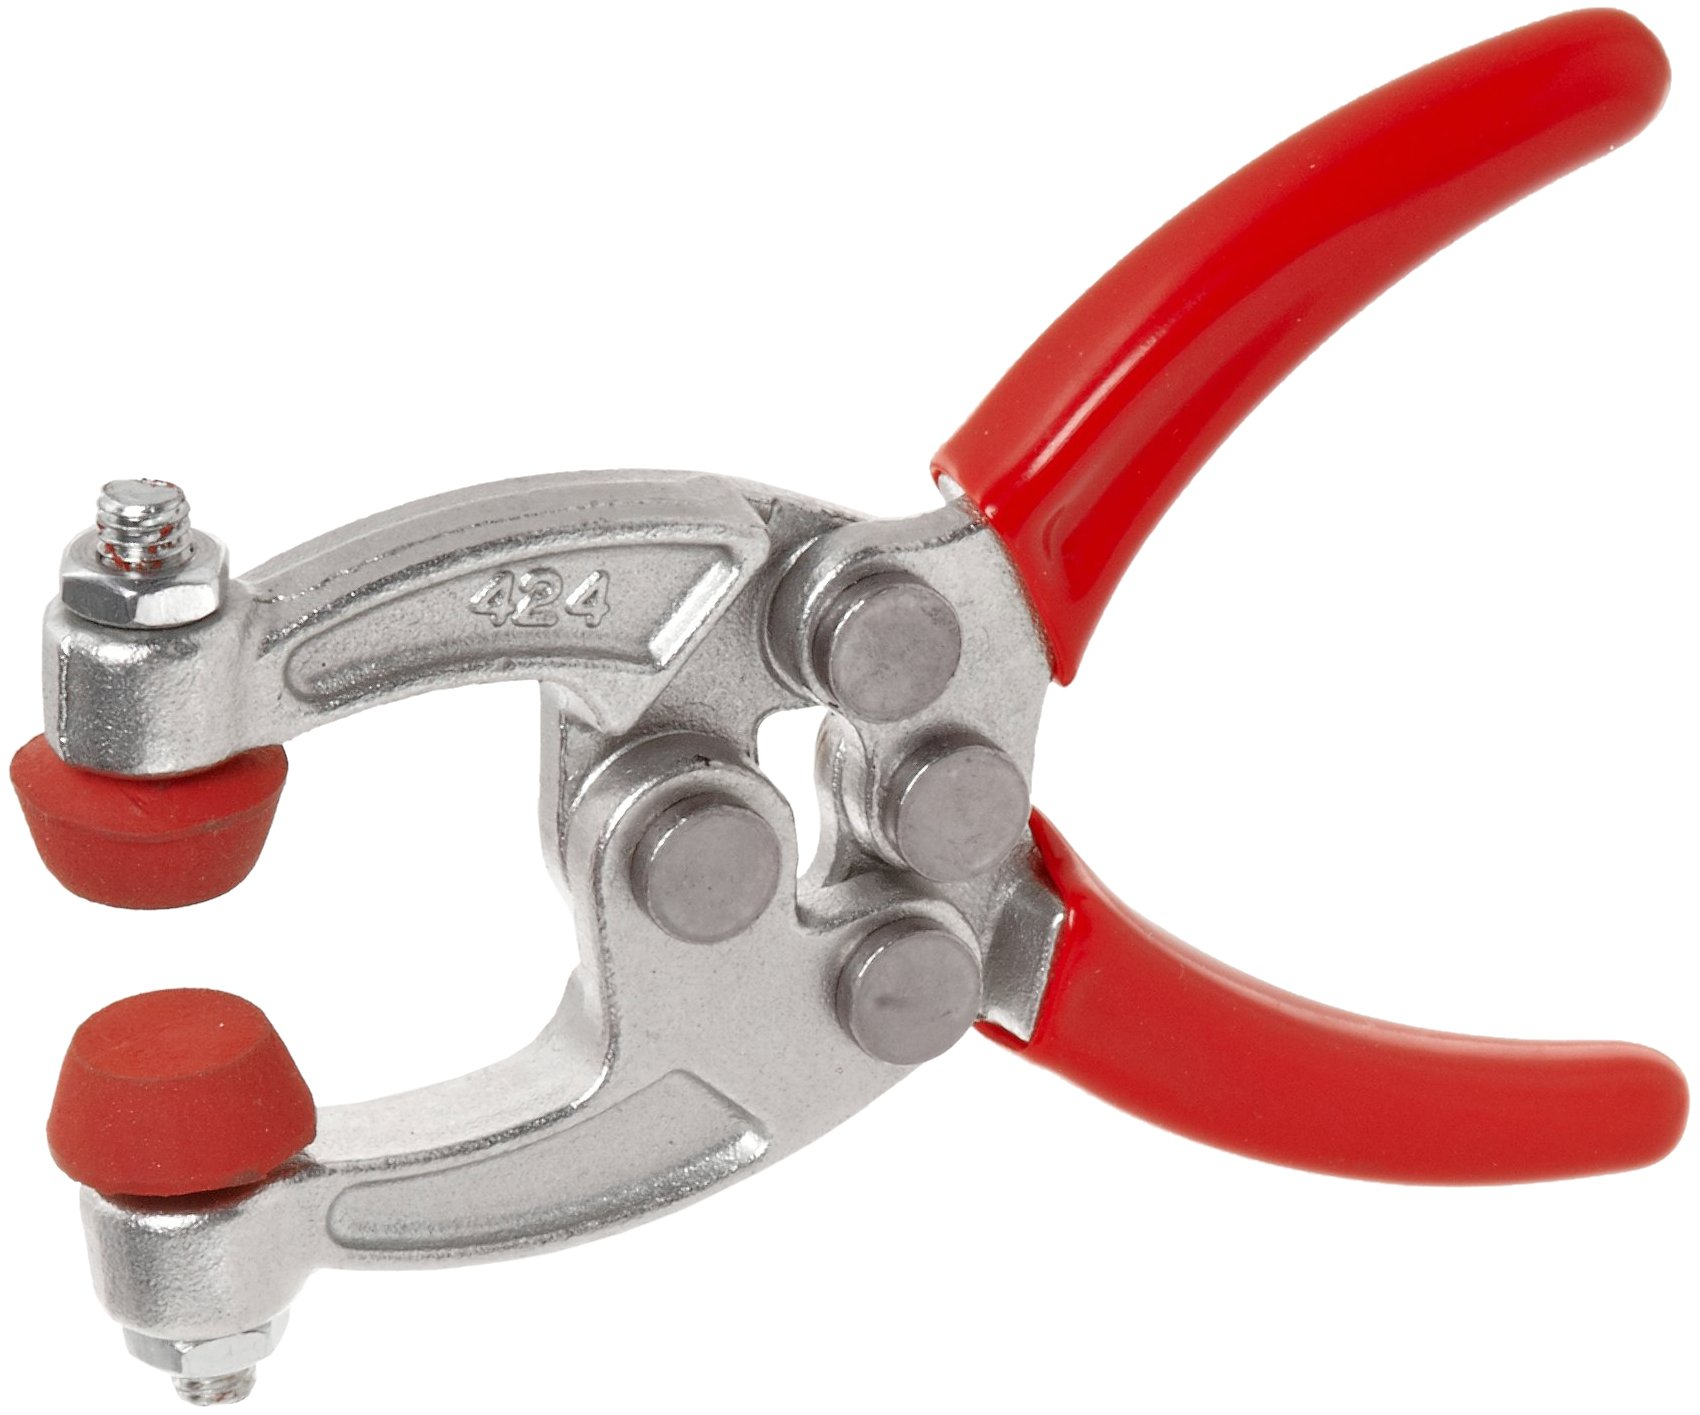 DE-STA-CO 424-2 Squeeze-Action Clamp by De-Sta-Co